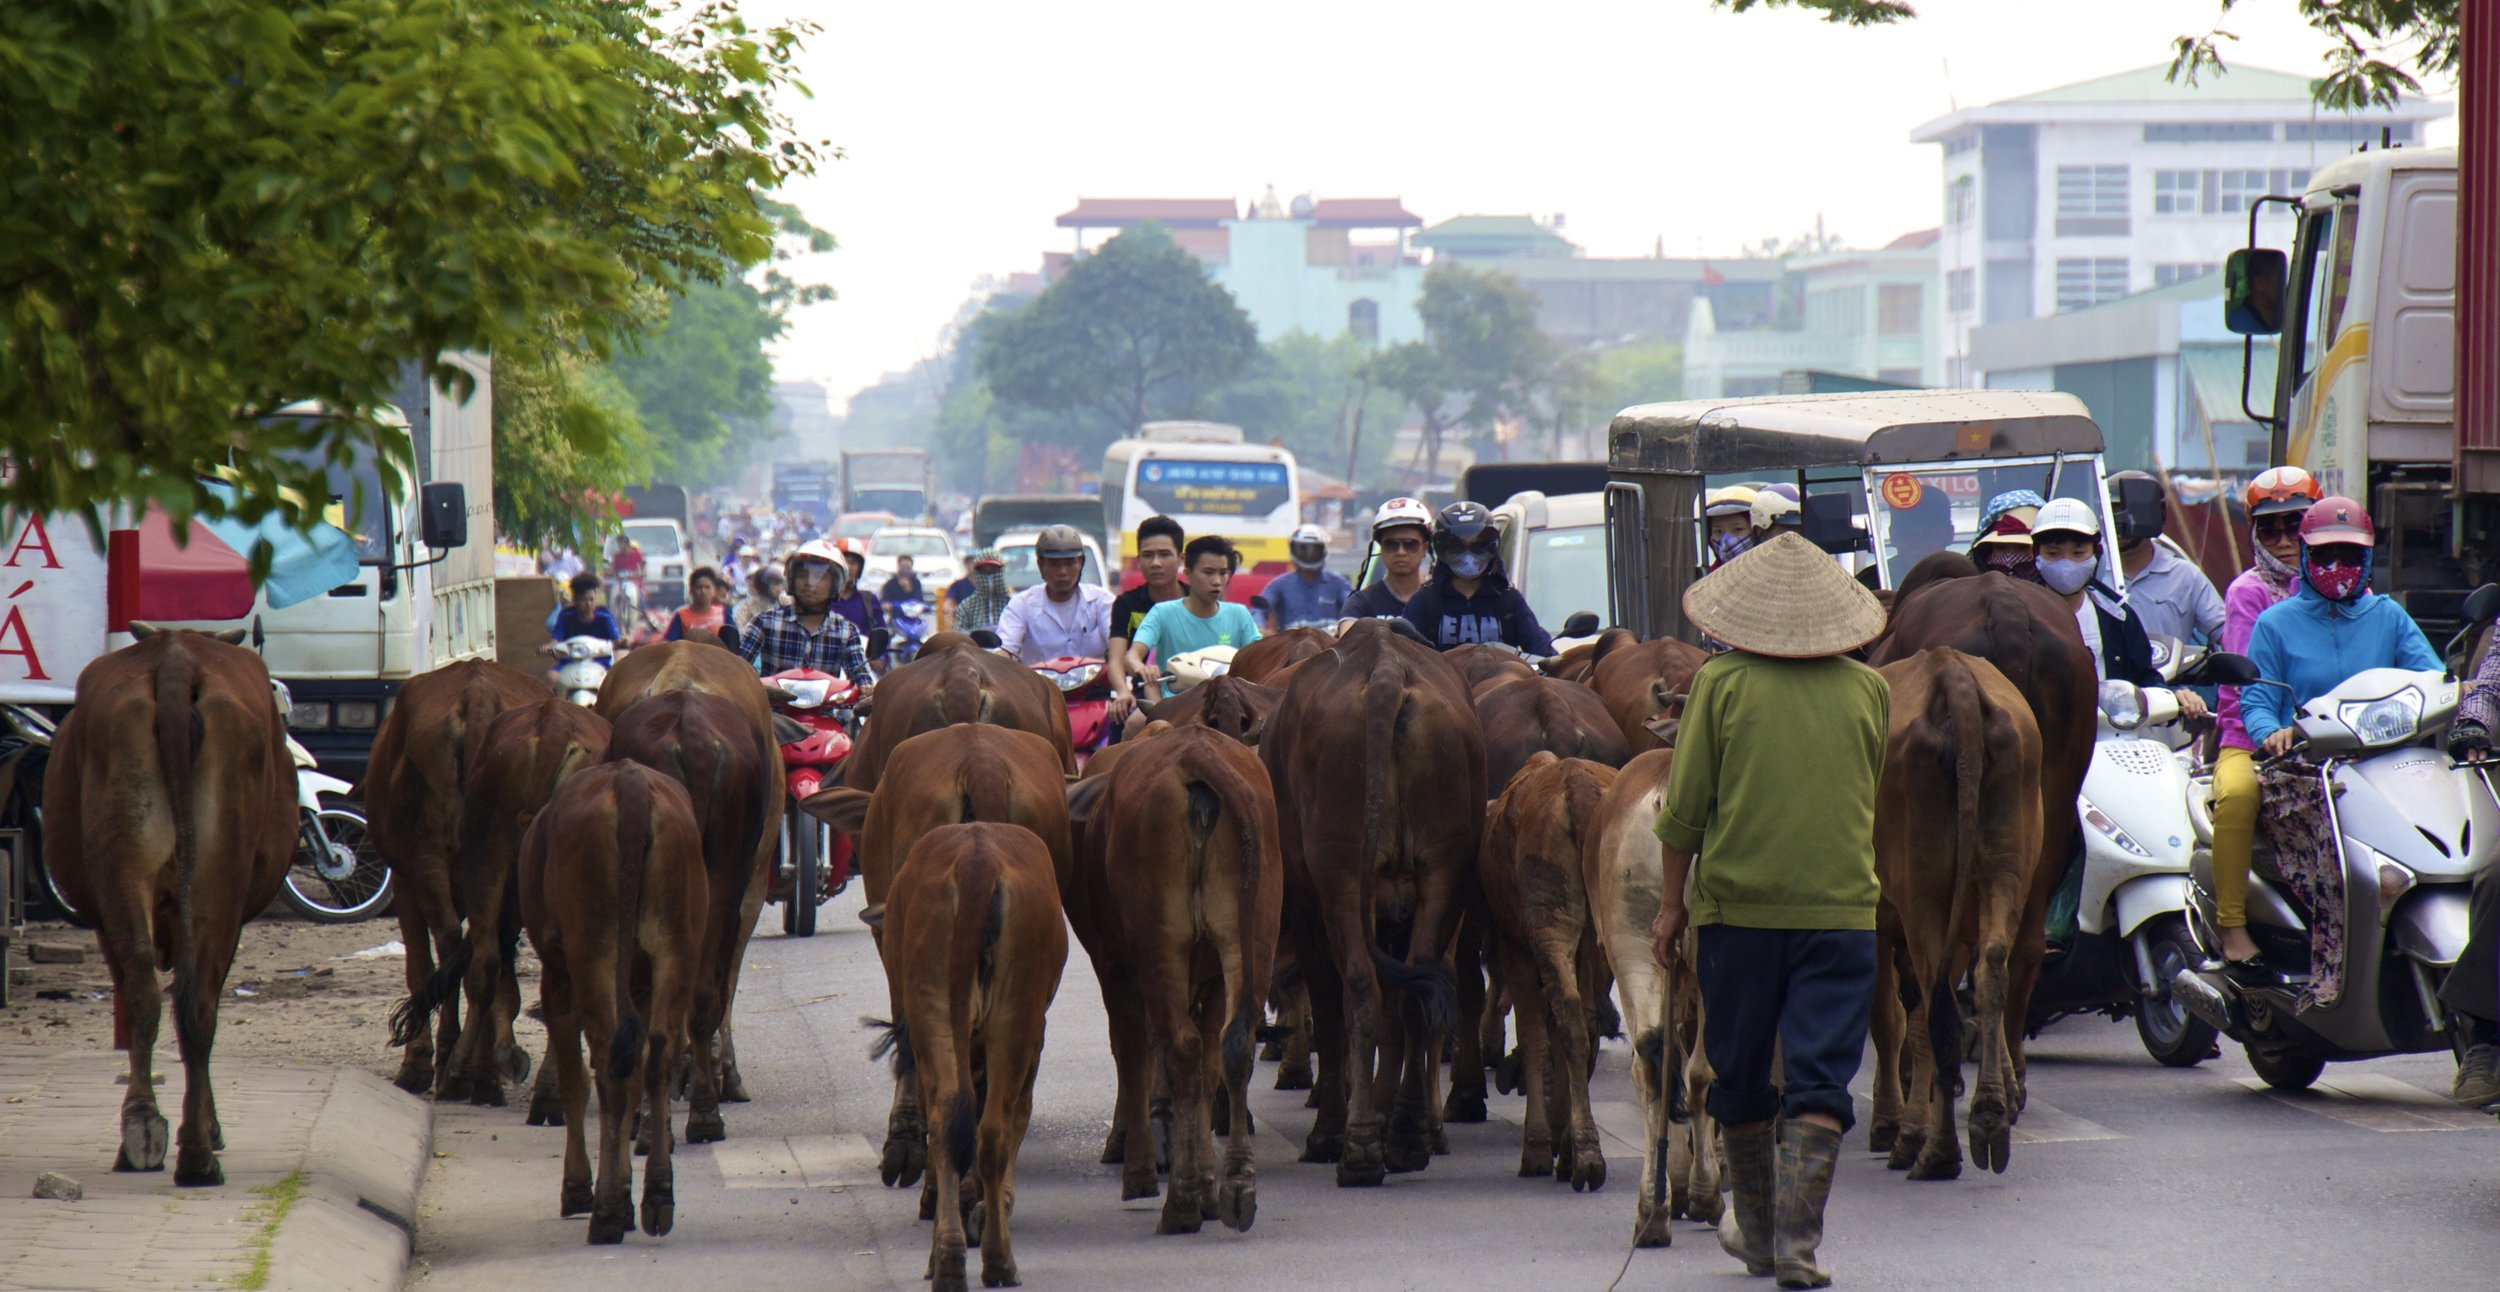 Bac Ninh Vietnam traffic.jpg